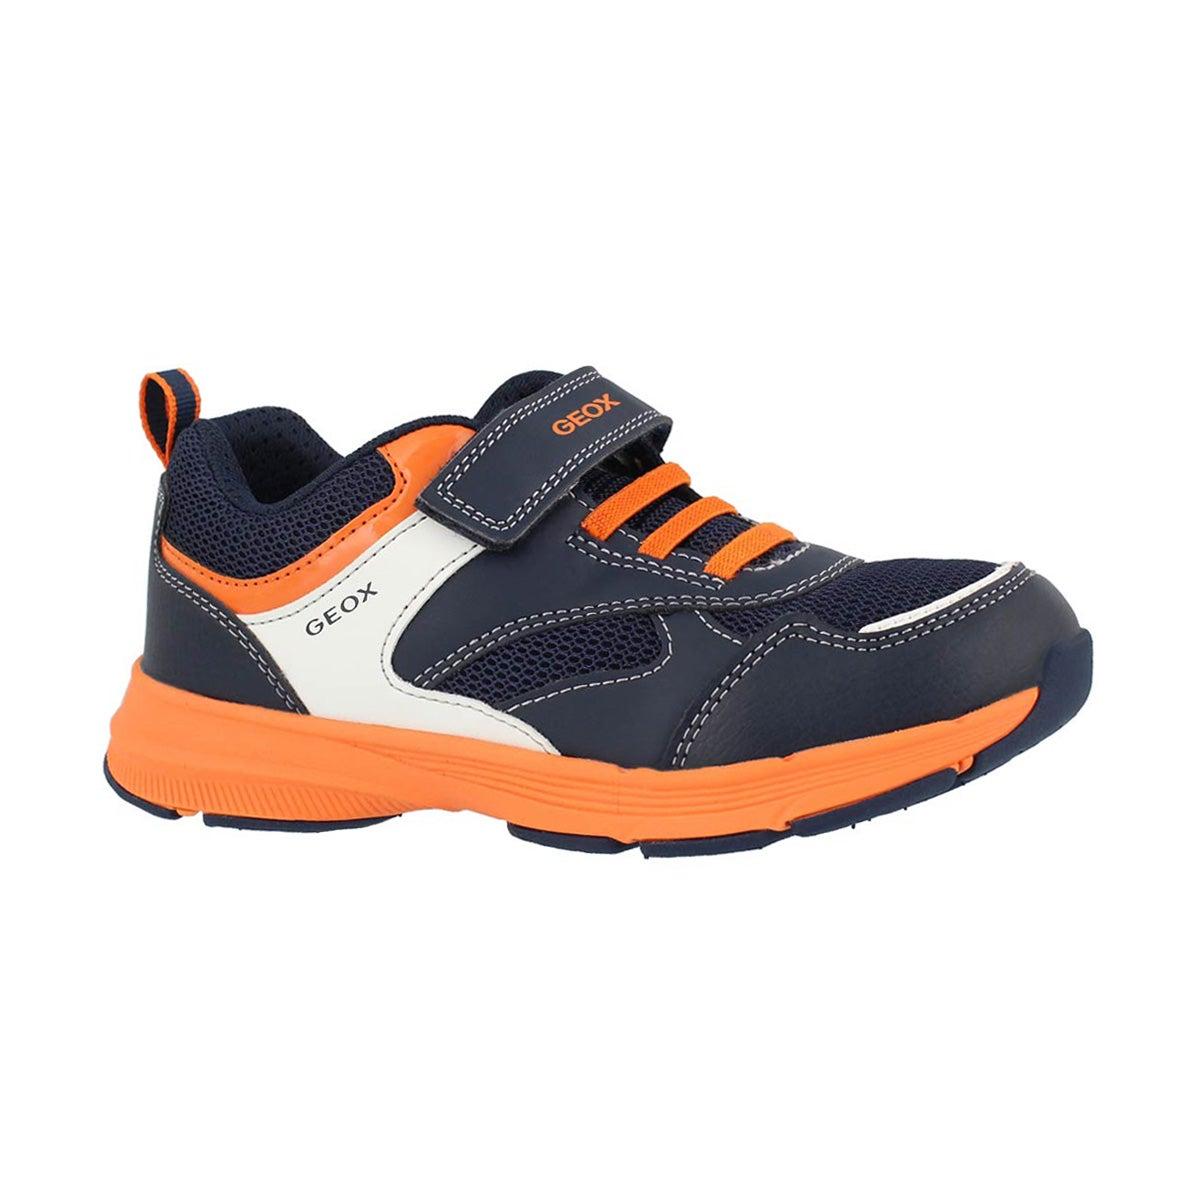 Boys' J HOSHIKO navy/orange sneakers